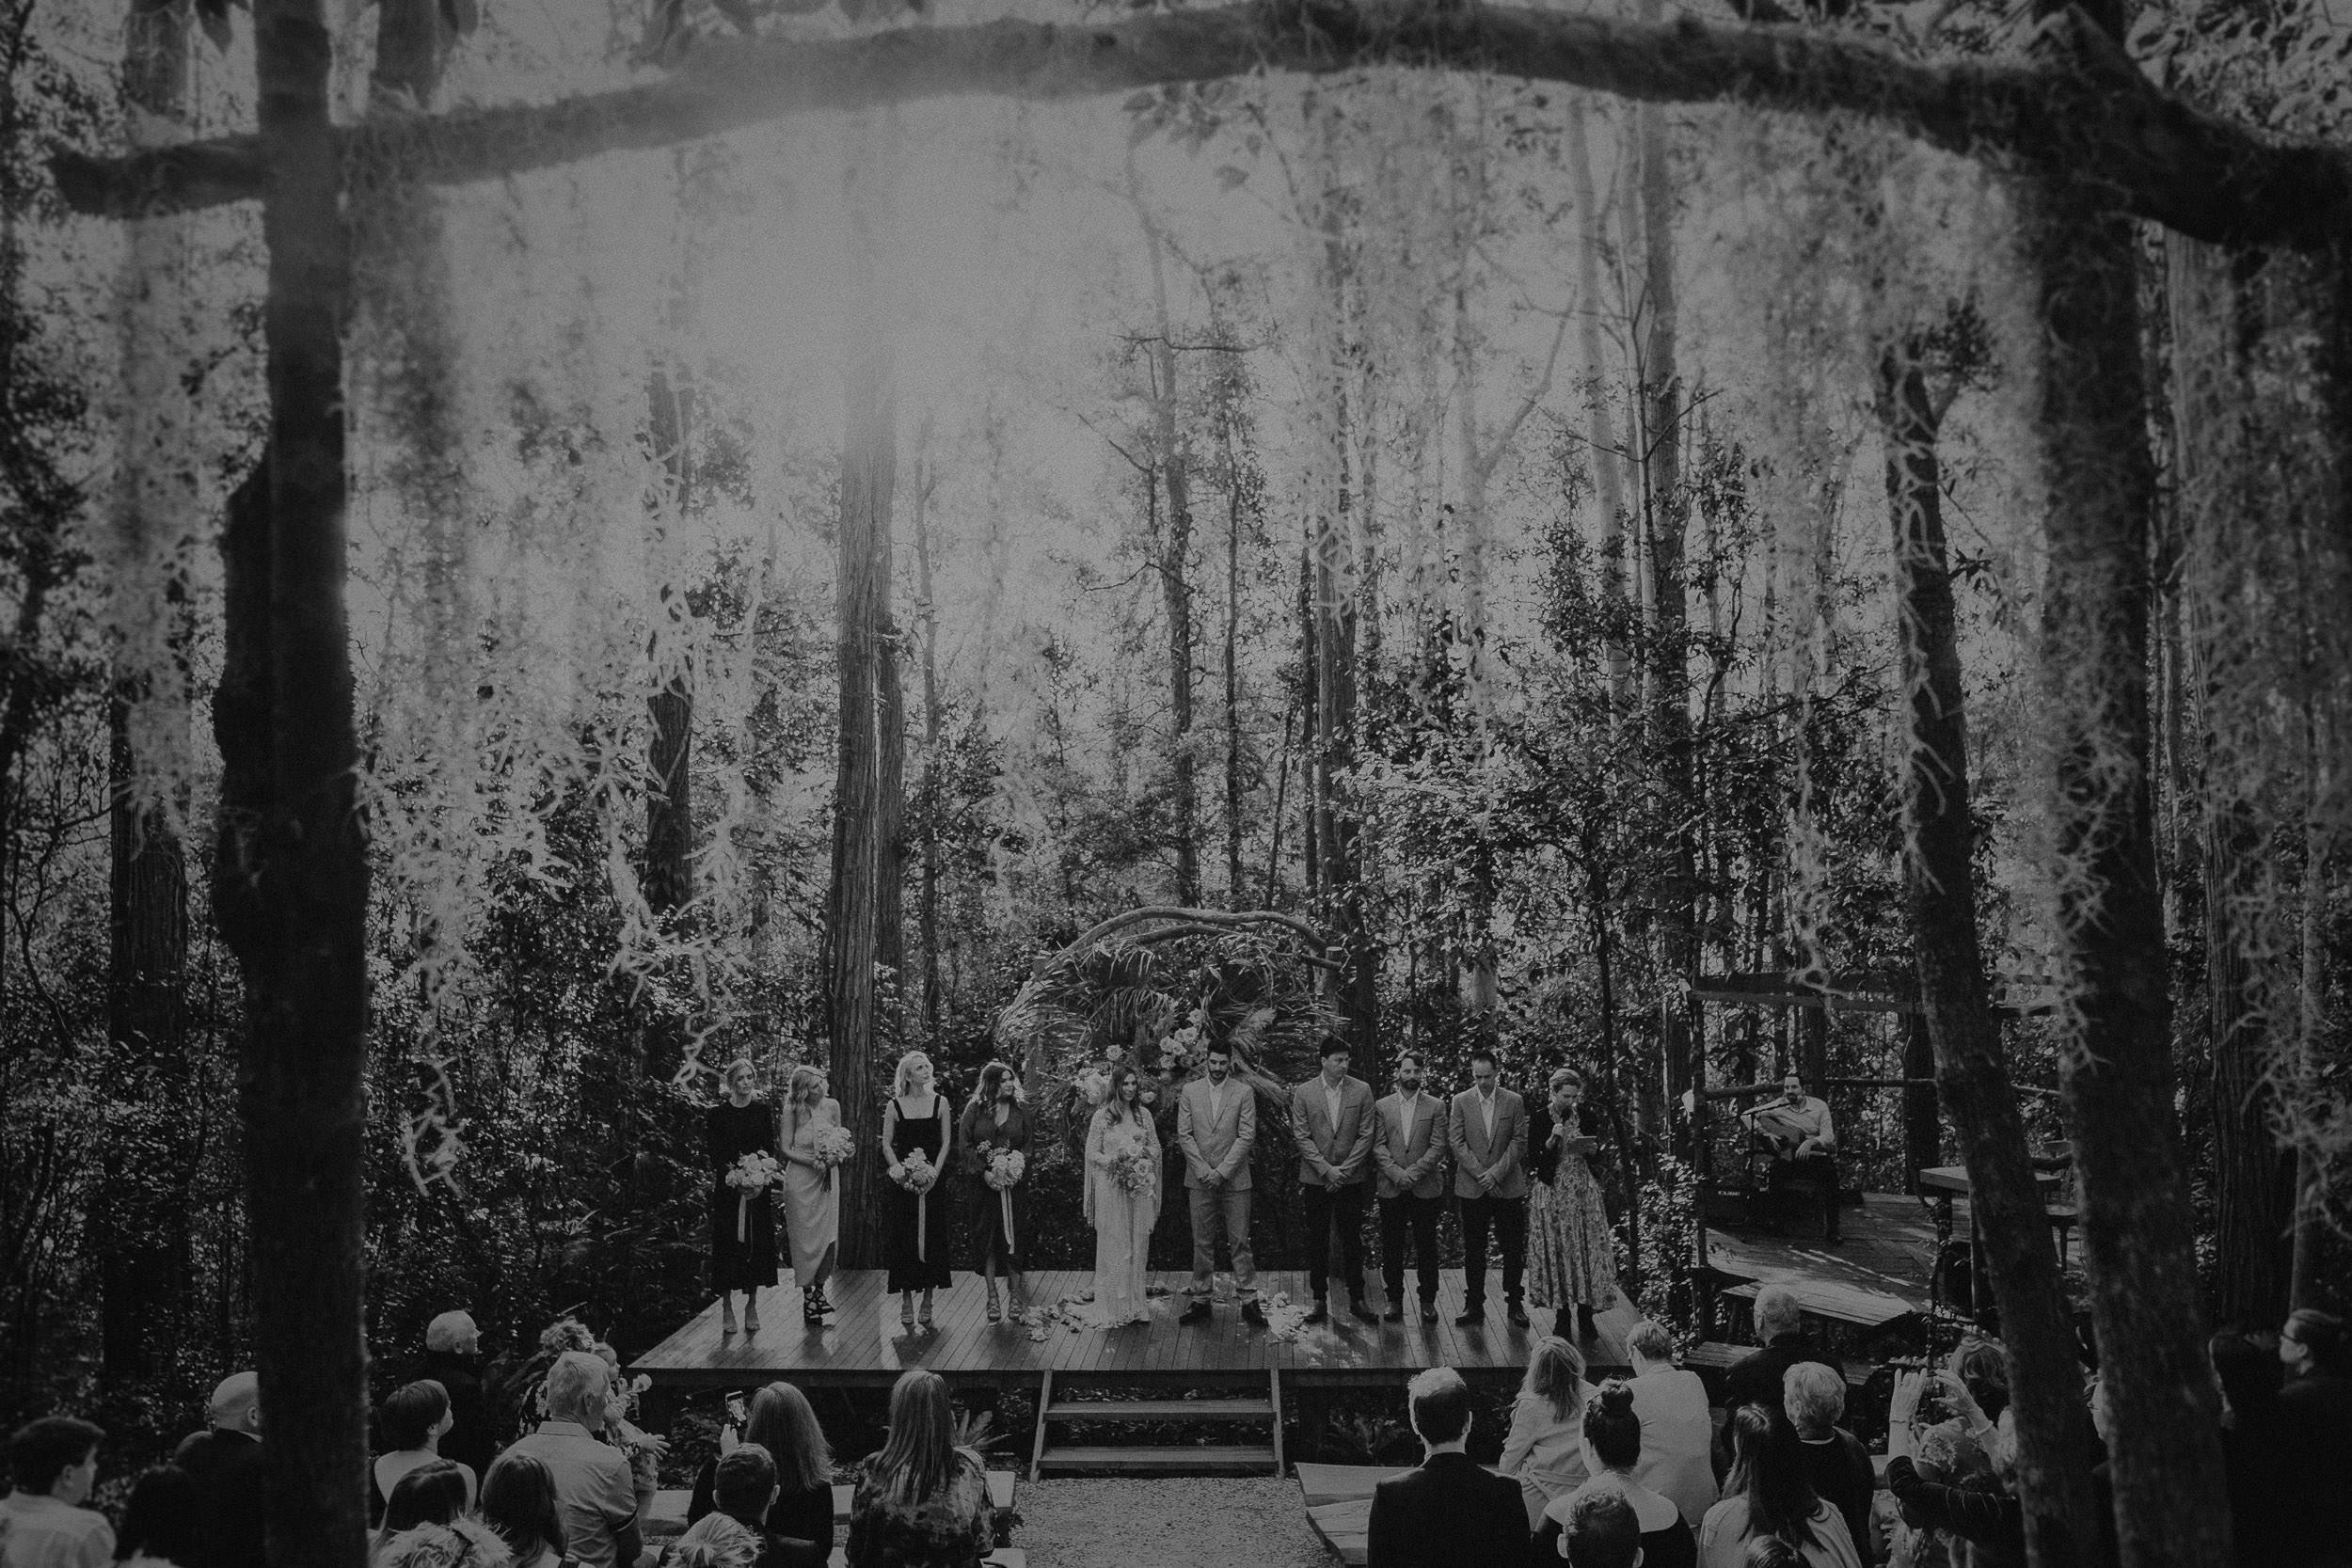 S&A Elopement - Kings & Thieves - Shred 'Til Dead - Central Coast Beach Forest Wedding - 177.jpg